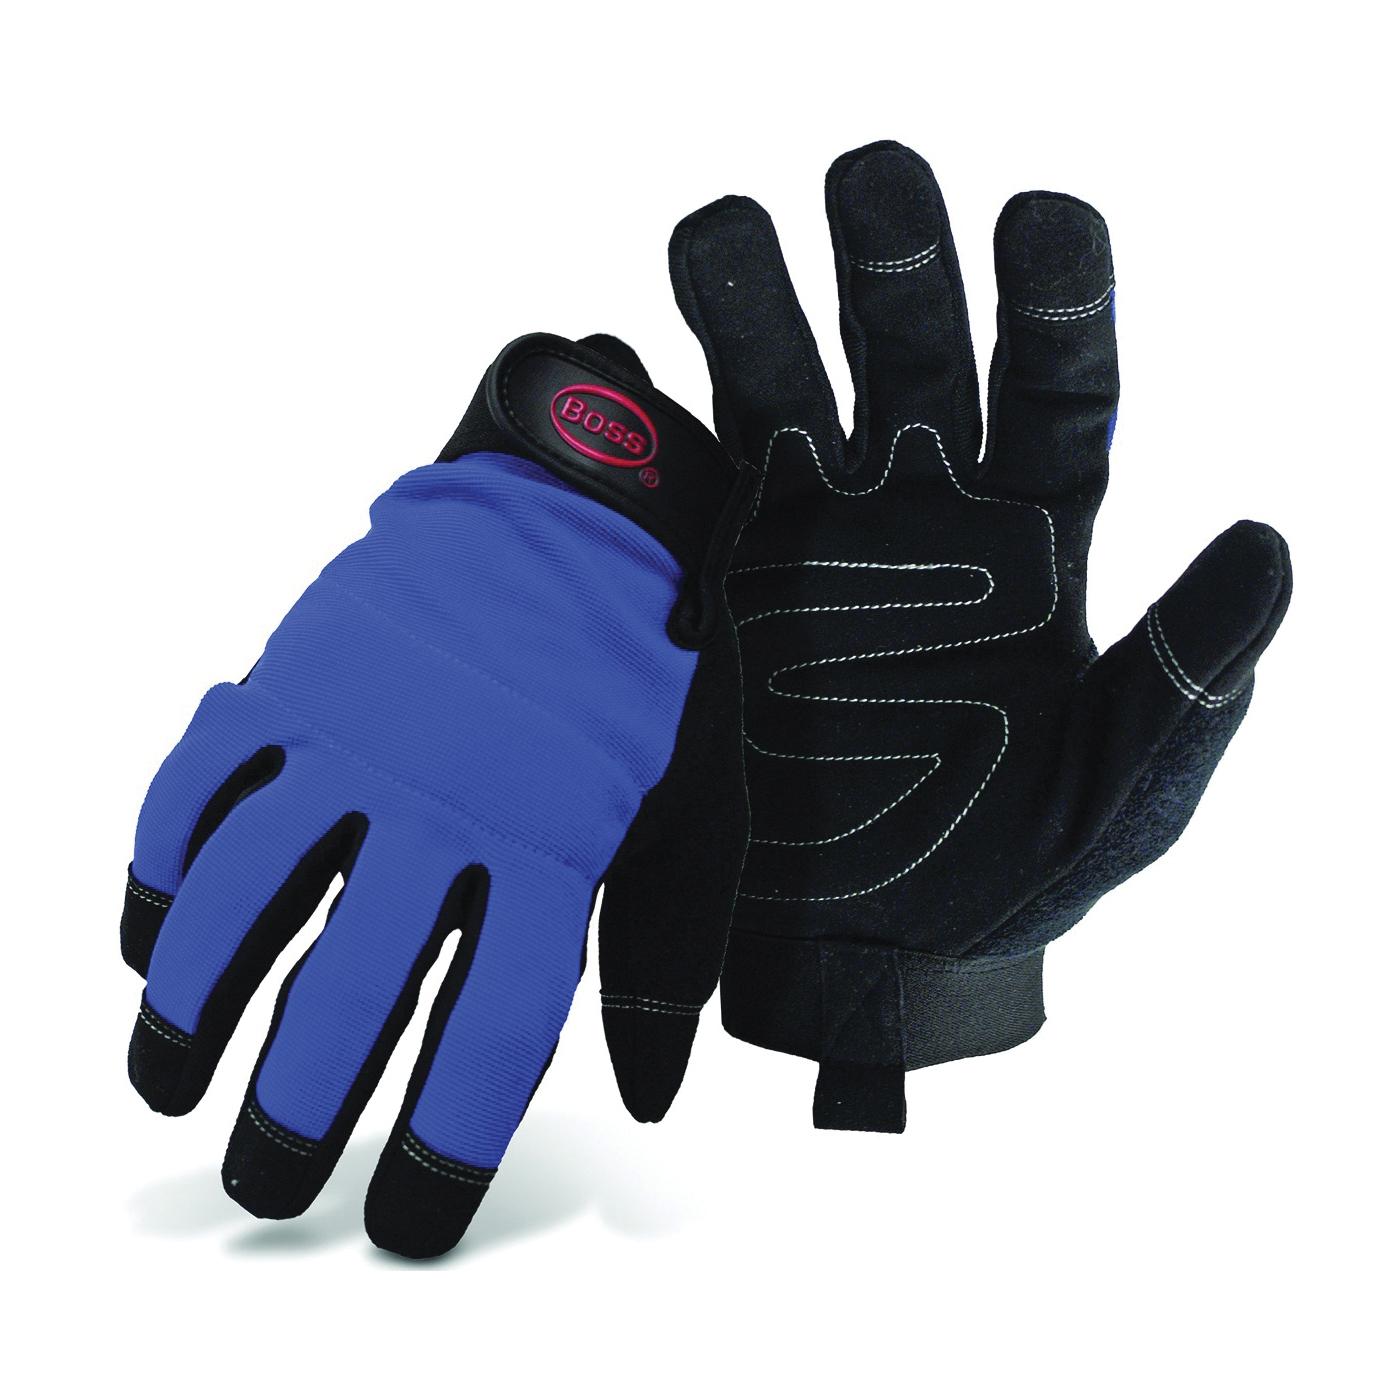 Picture of BOSS 5205L Mechanic's Gloves, Men's, L, Reinforced Thumb, Wrist Strap Cuff, Blue